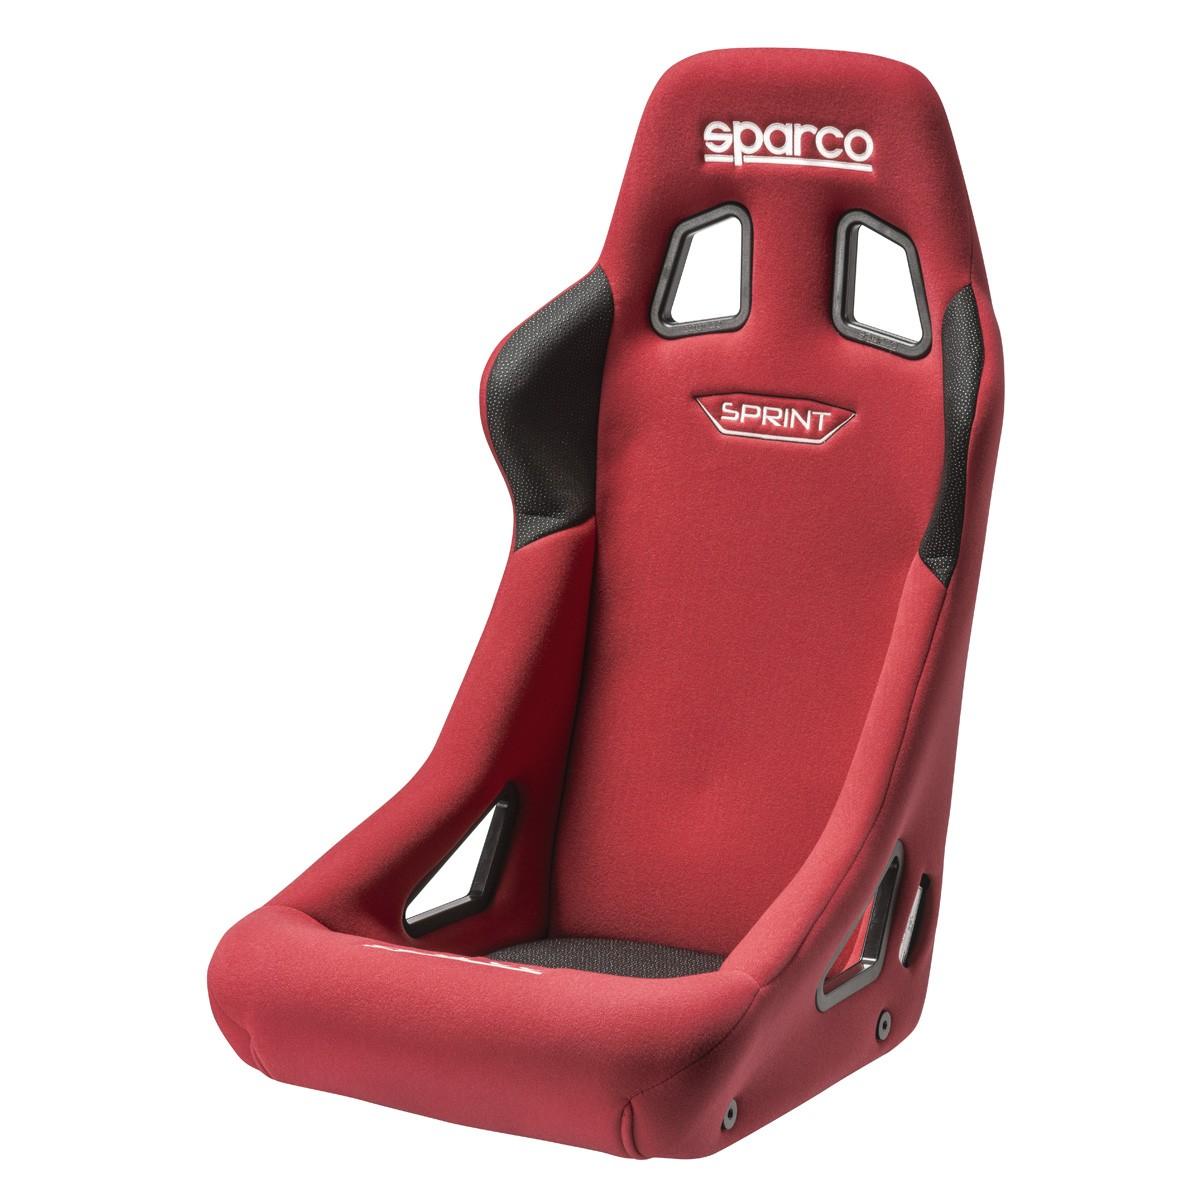 Awe Inspiring Sparco Sprint Race Seat Machost Co Dining Chair Design Ideas Machostcouk